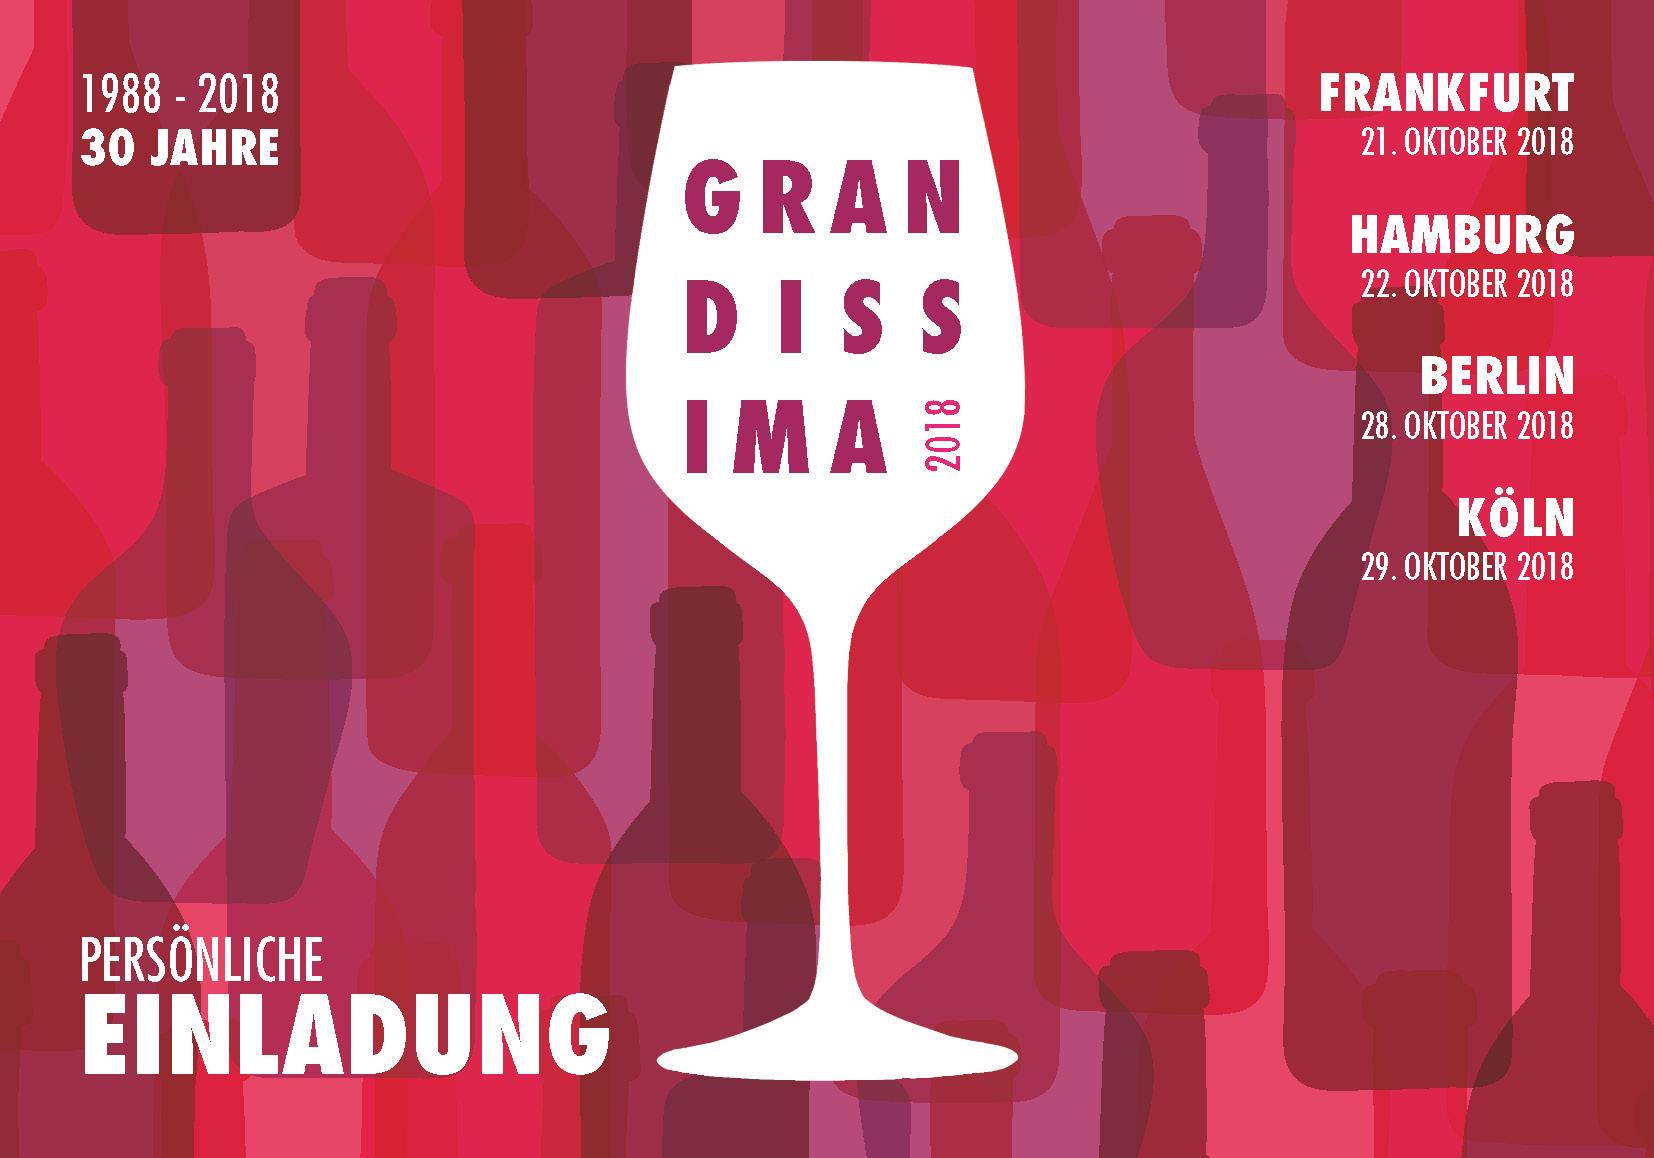 Grandissima 2018 - Frankfurt